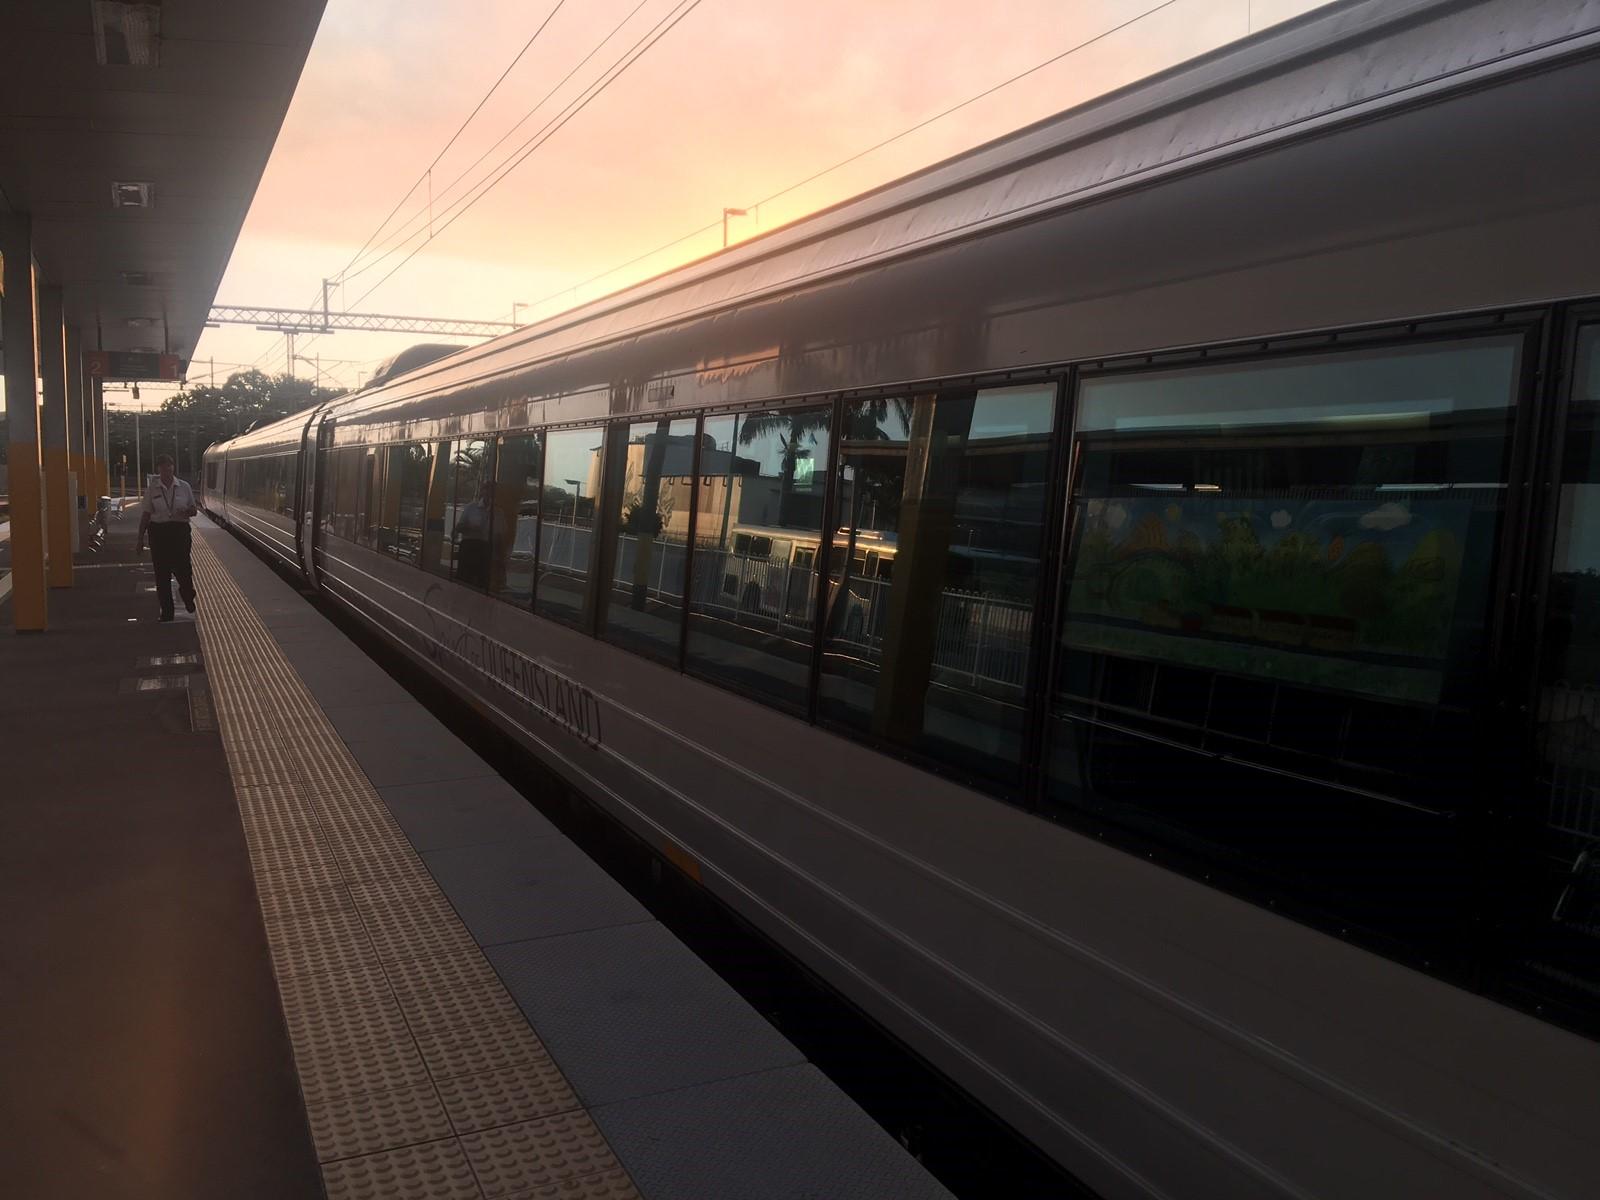 The northbound tilt train that will stop at Bundaberg after devastating fires forced track closures between Mackay and Bundaberg.